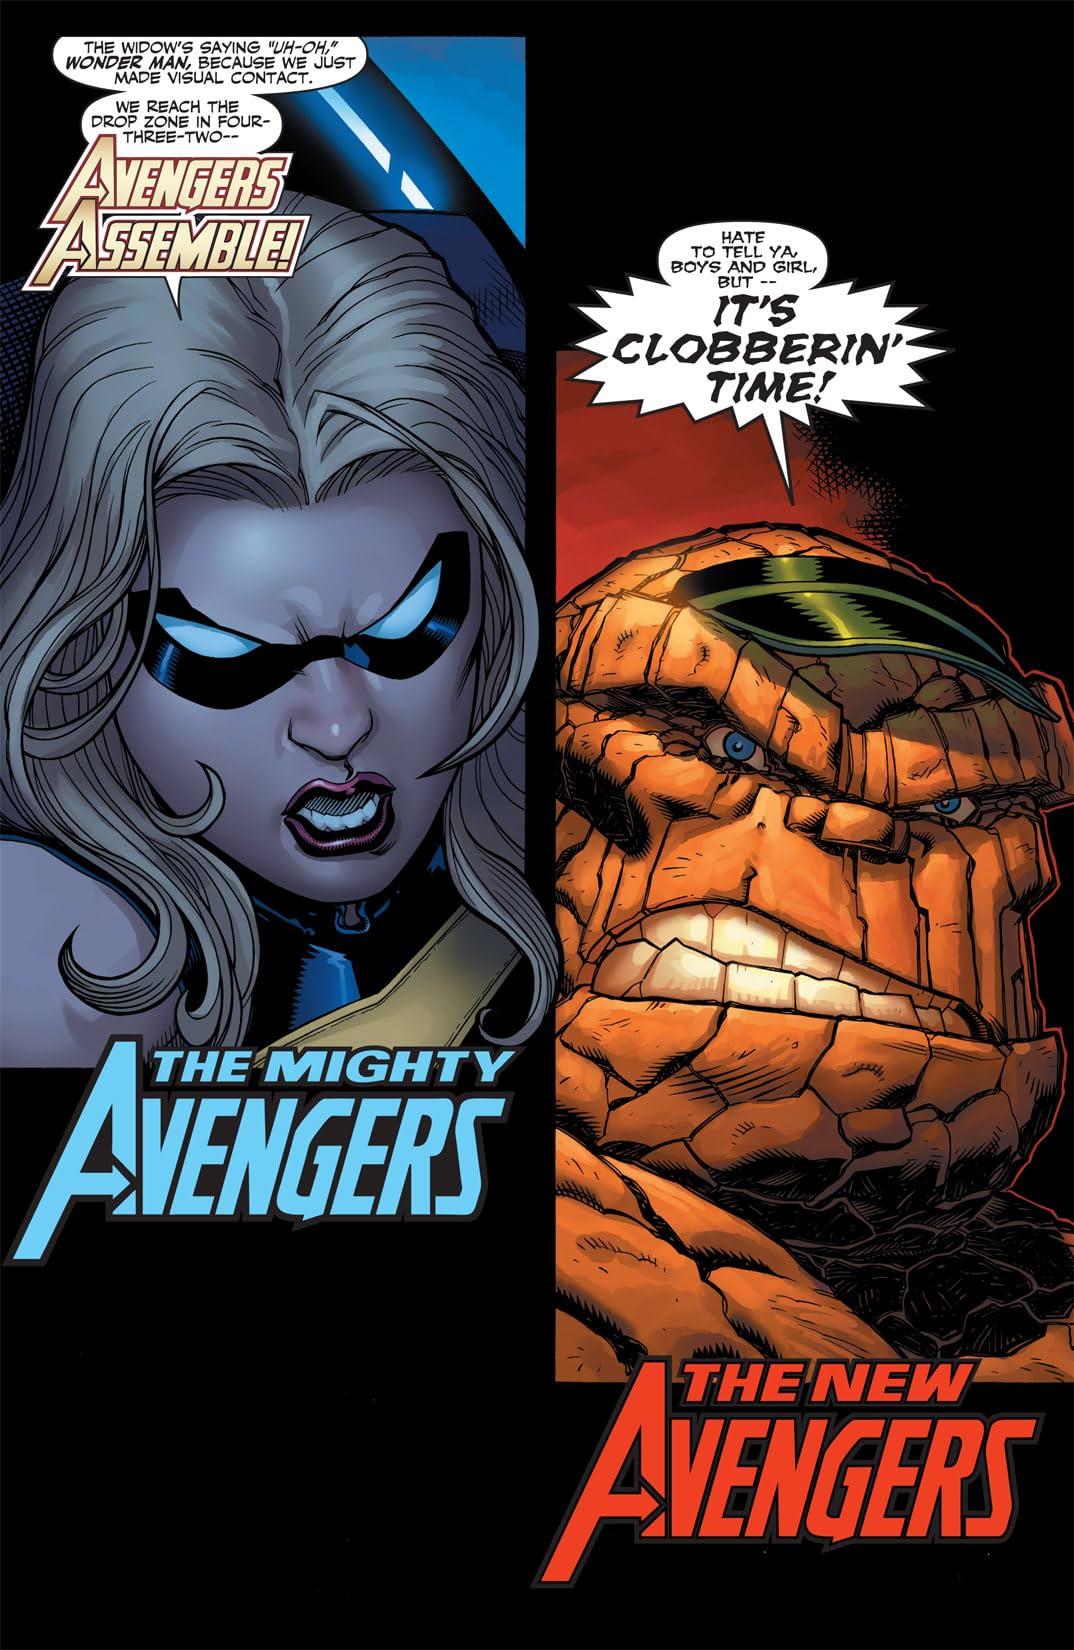 Fallen Son: Death of Captain America #2: Avengers